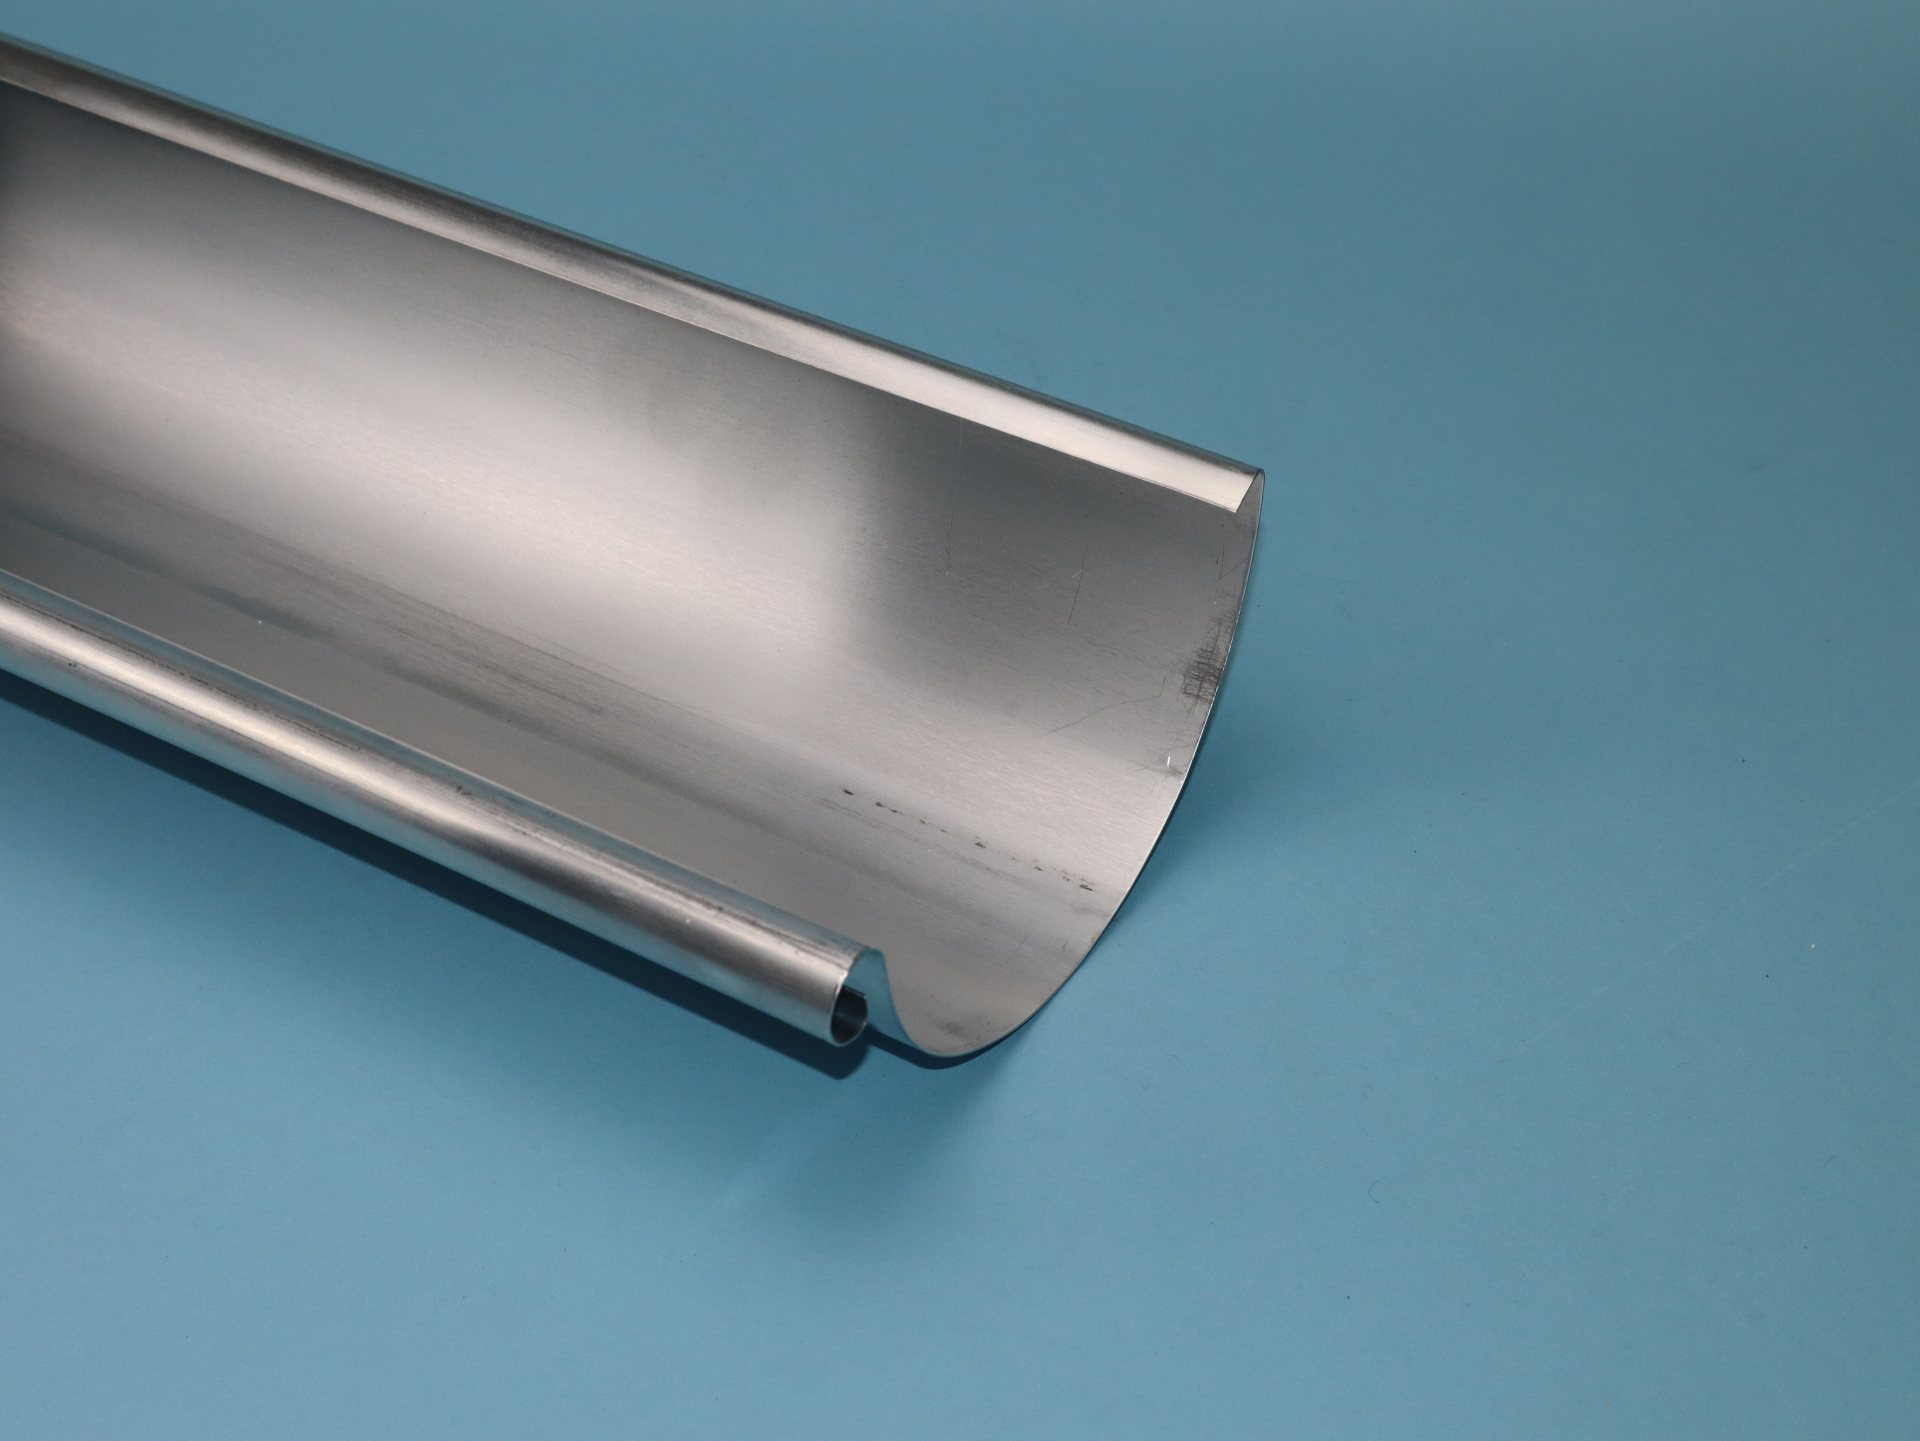 Dachrinne halbrund Aluminium, 3m lang, Größe auswählbar